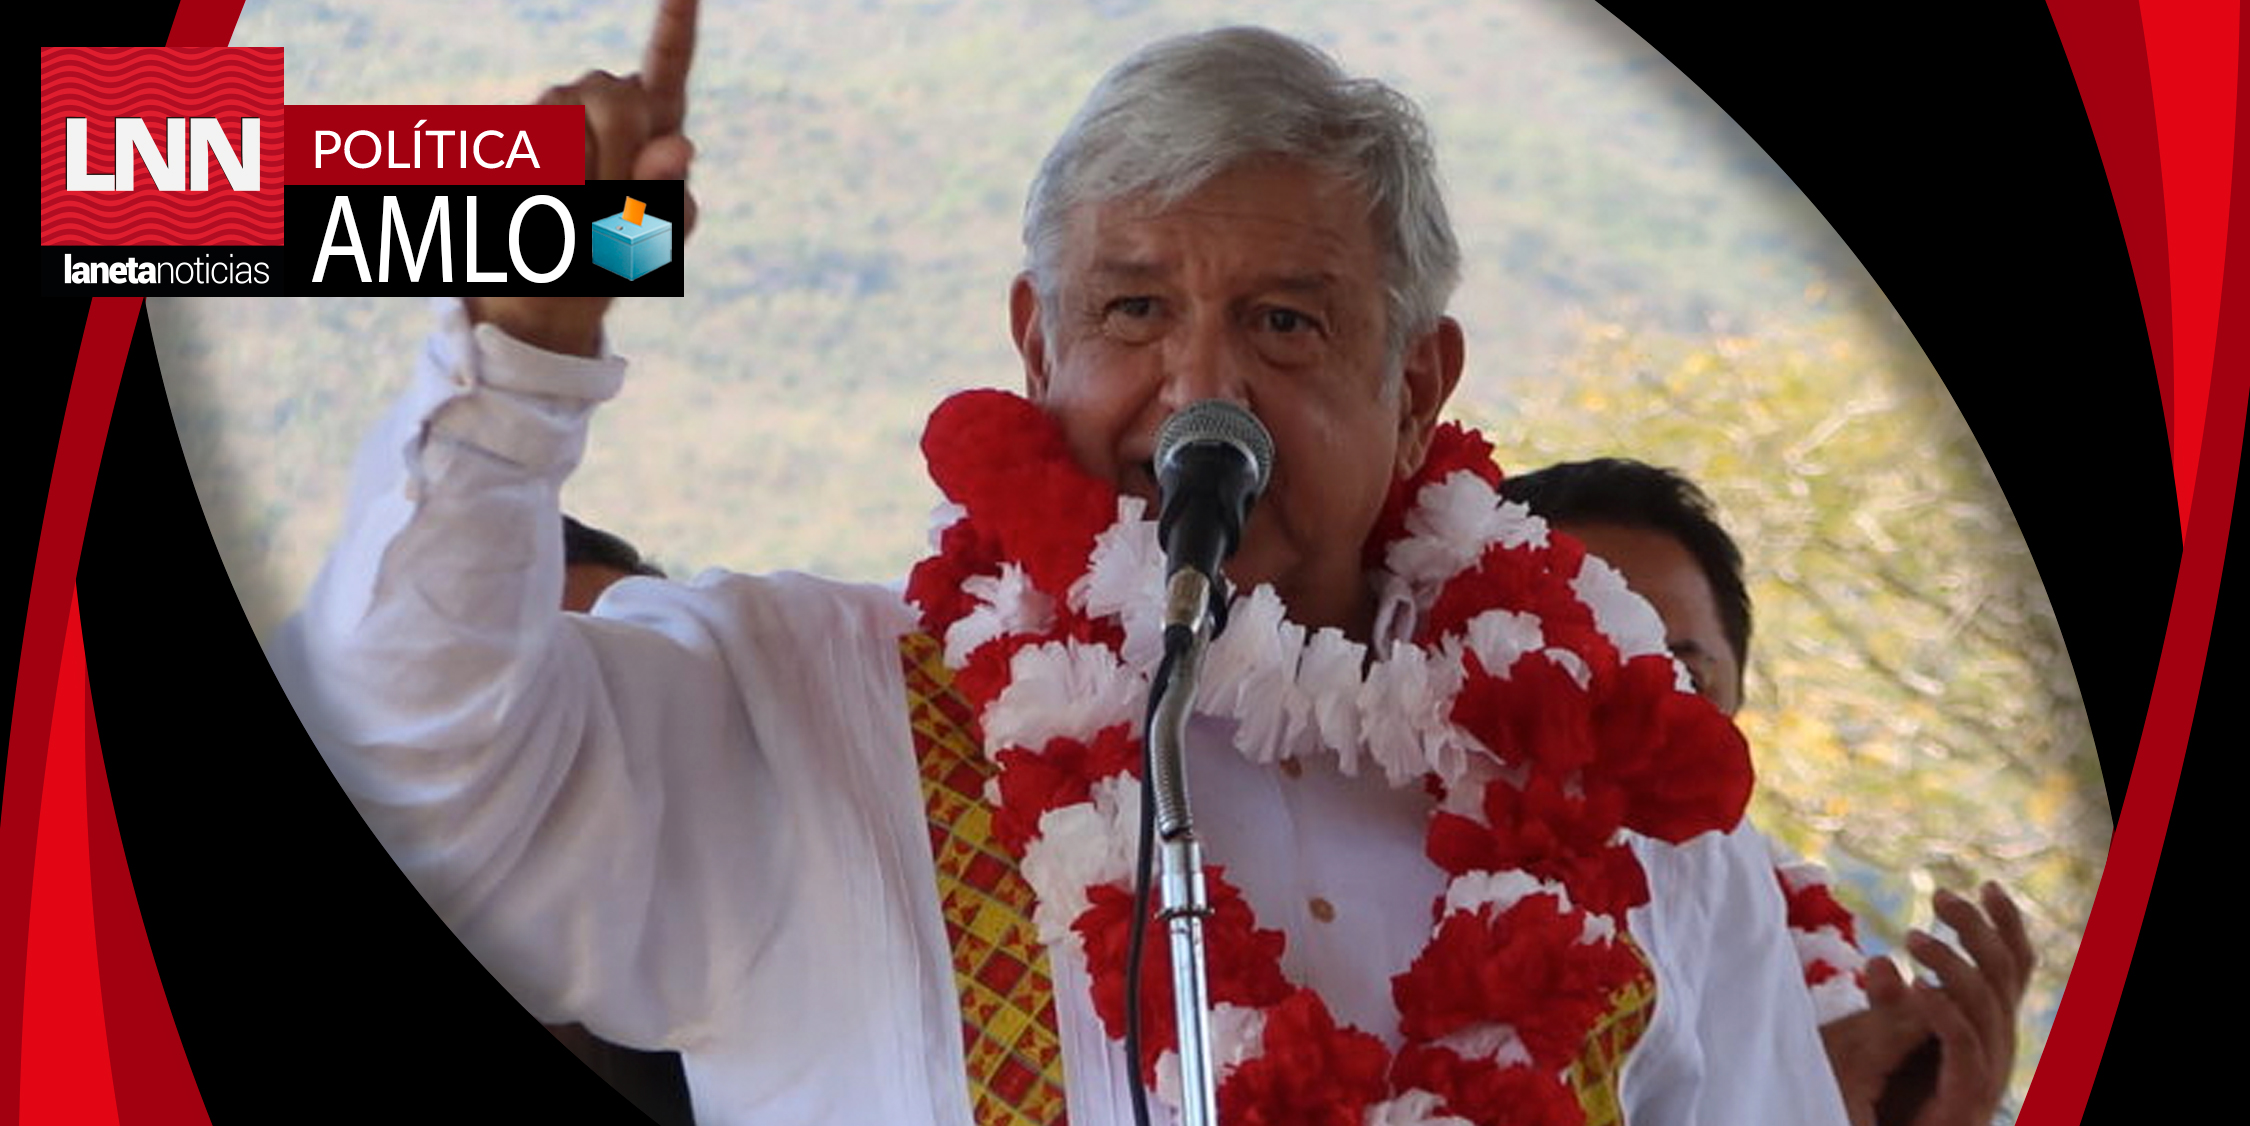 AMLO manda un 'consejito' a Peña Nieto para que PRI triunfe en 2018